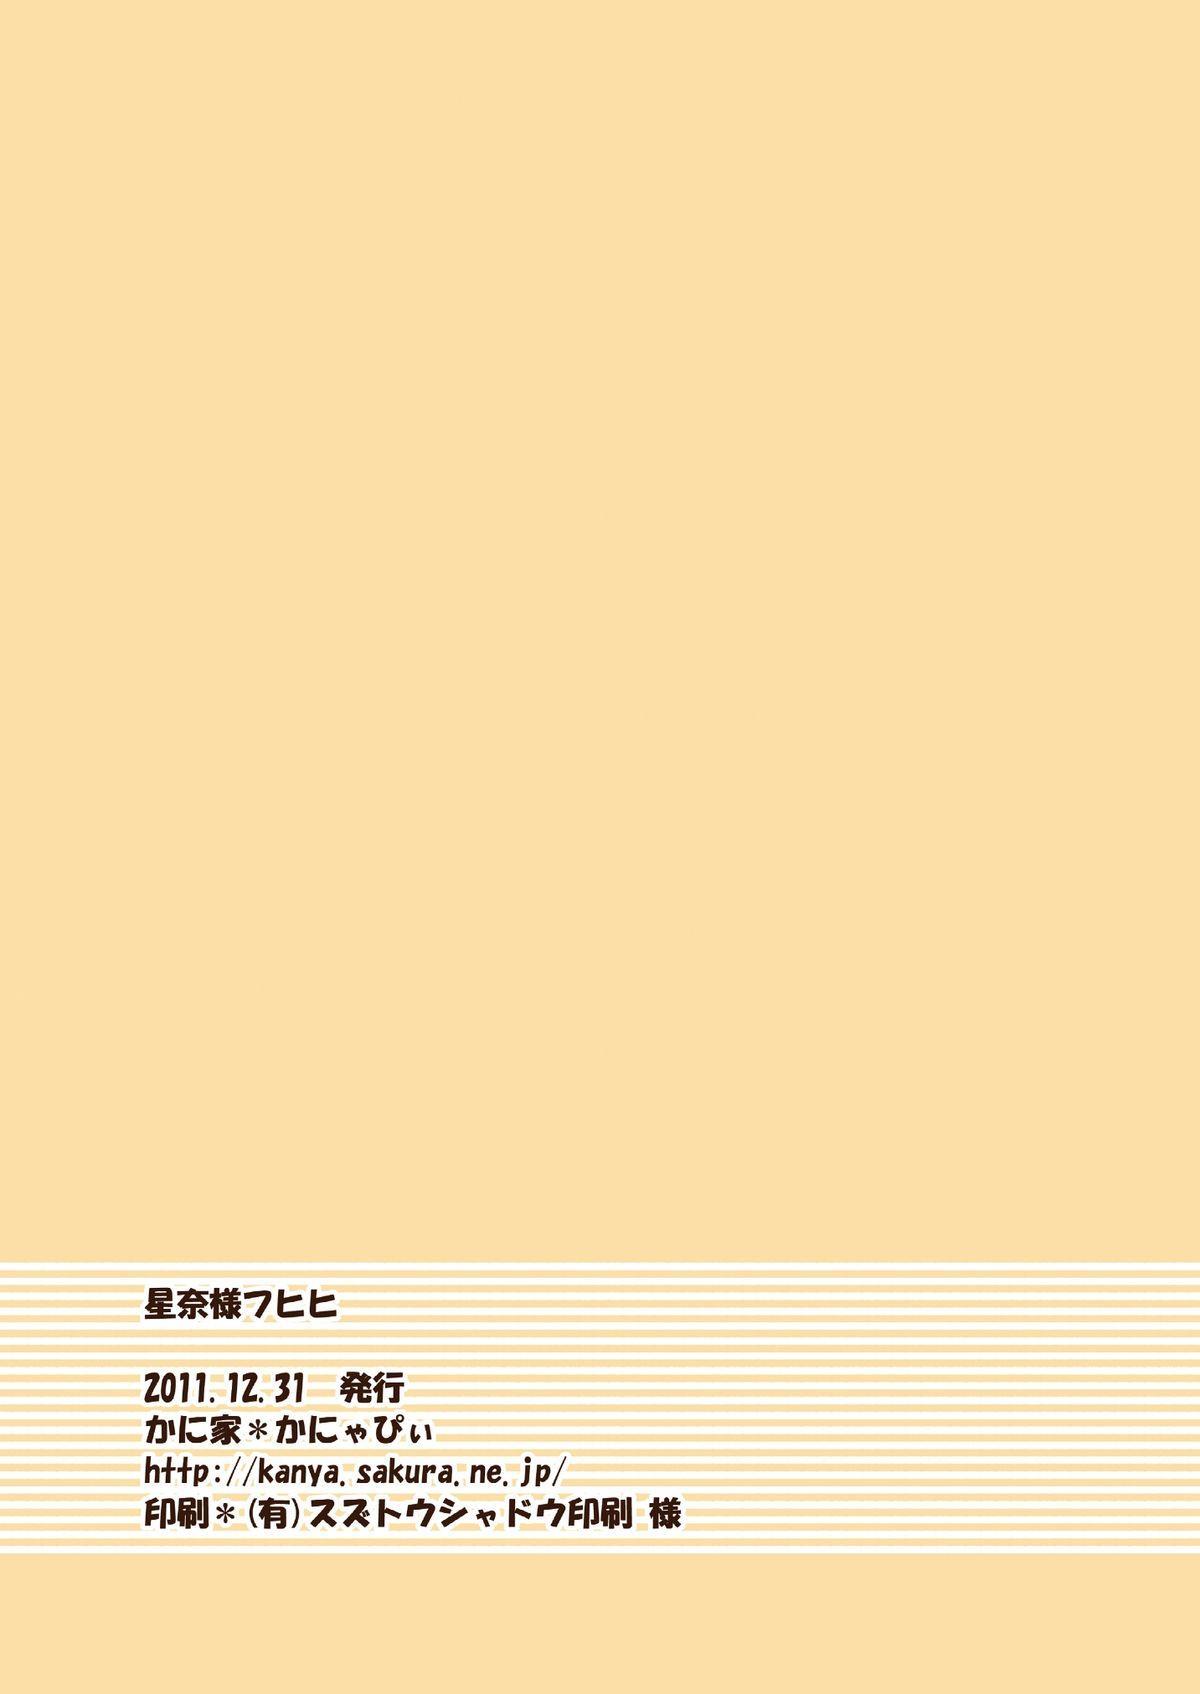 Sena-sama Fuhihi 23